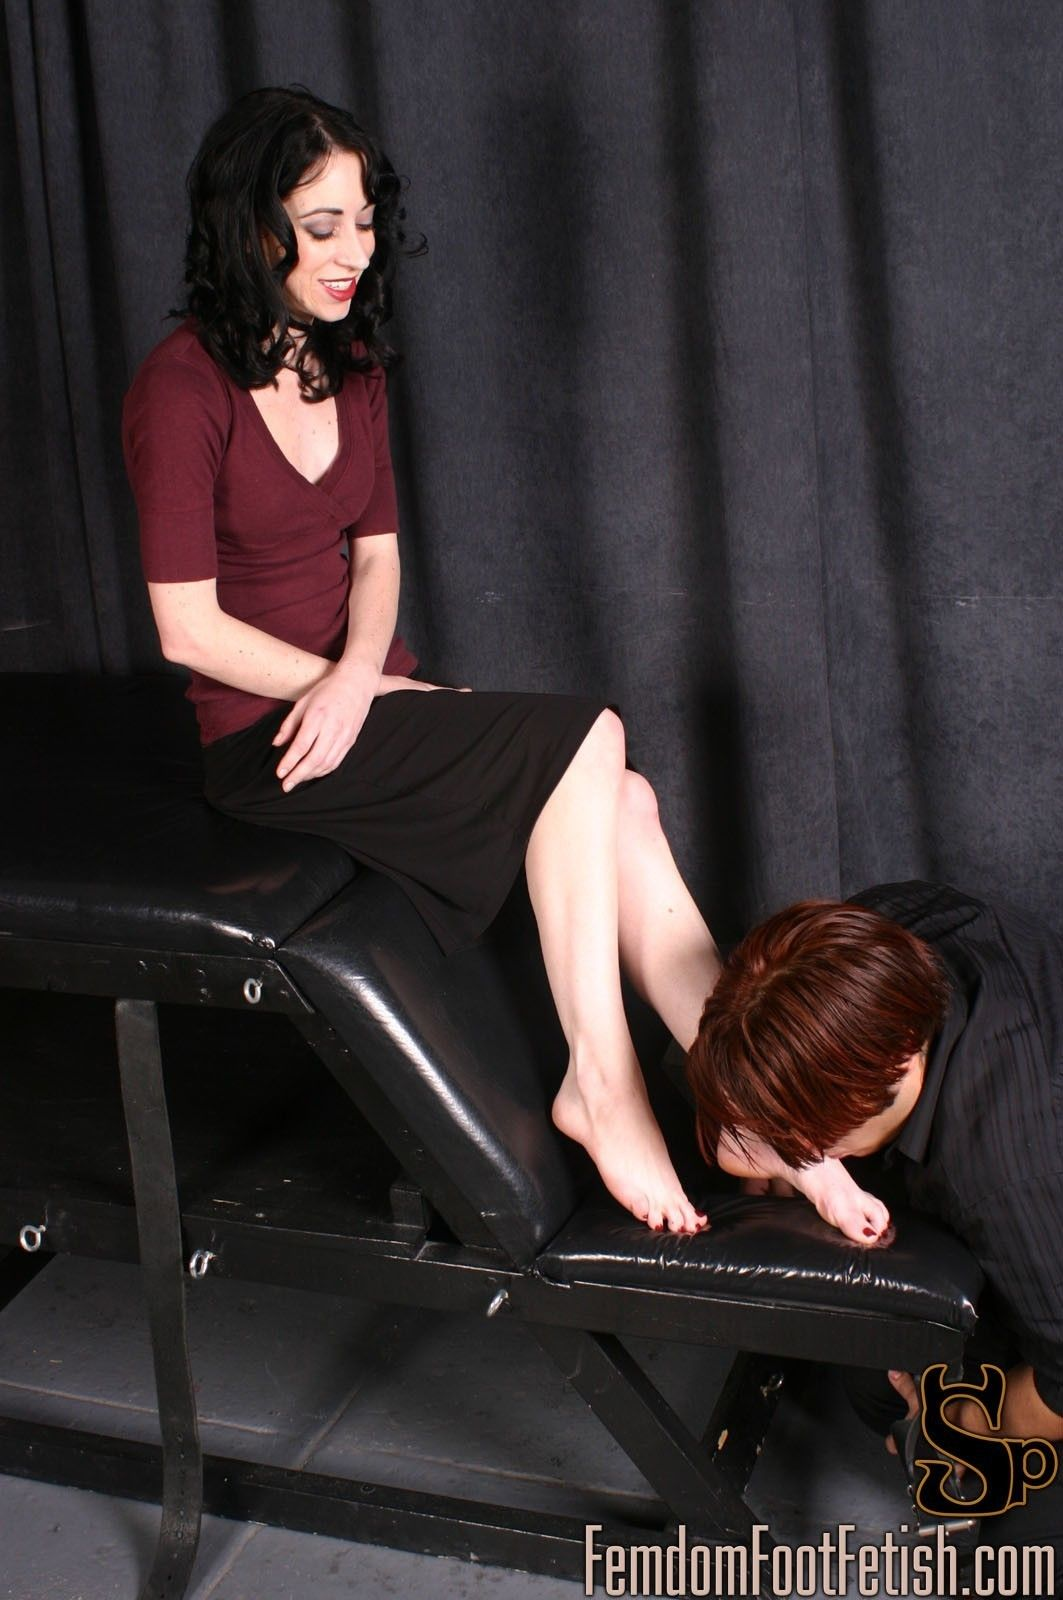 bare-foot-femdom